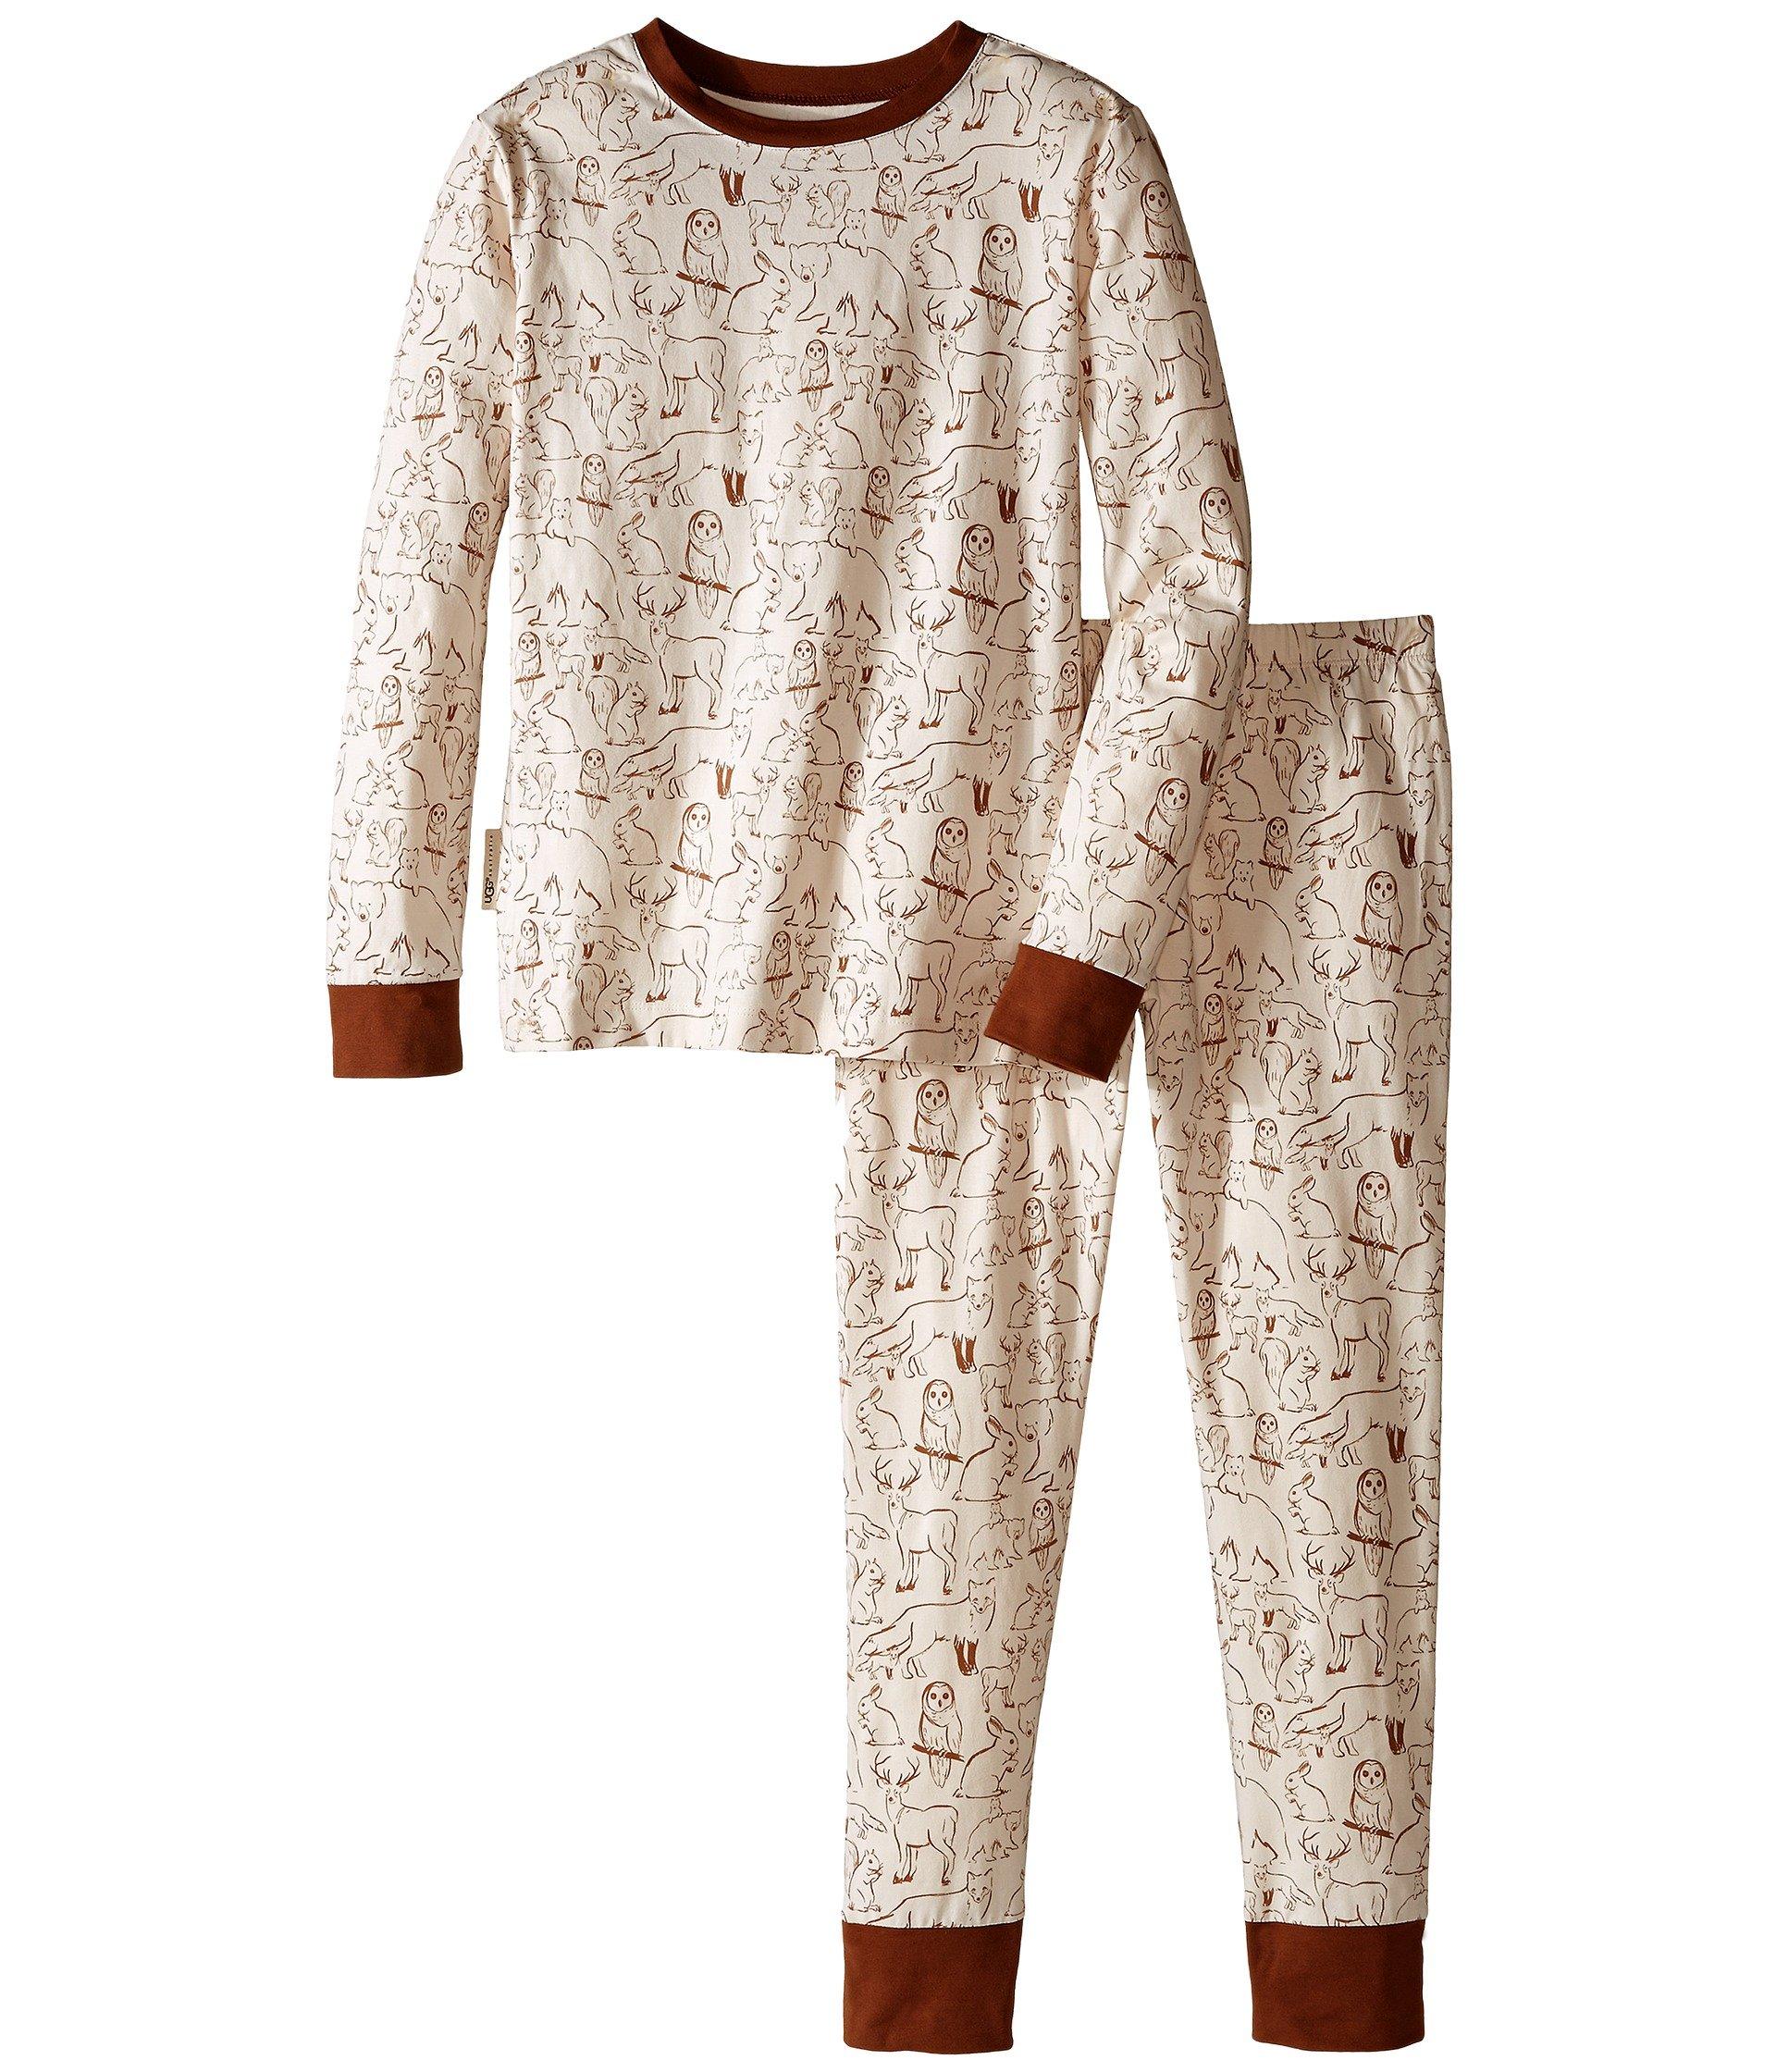 Pijama para Niño UGG Kids Rascal Pj Set (Little Kids/Big Kids)  + UGG en VeoyCompro.net